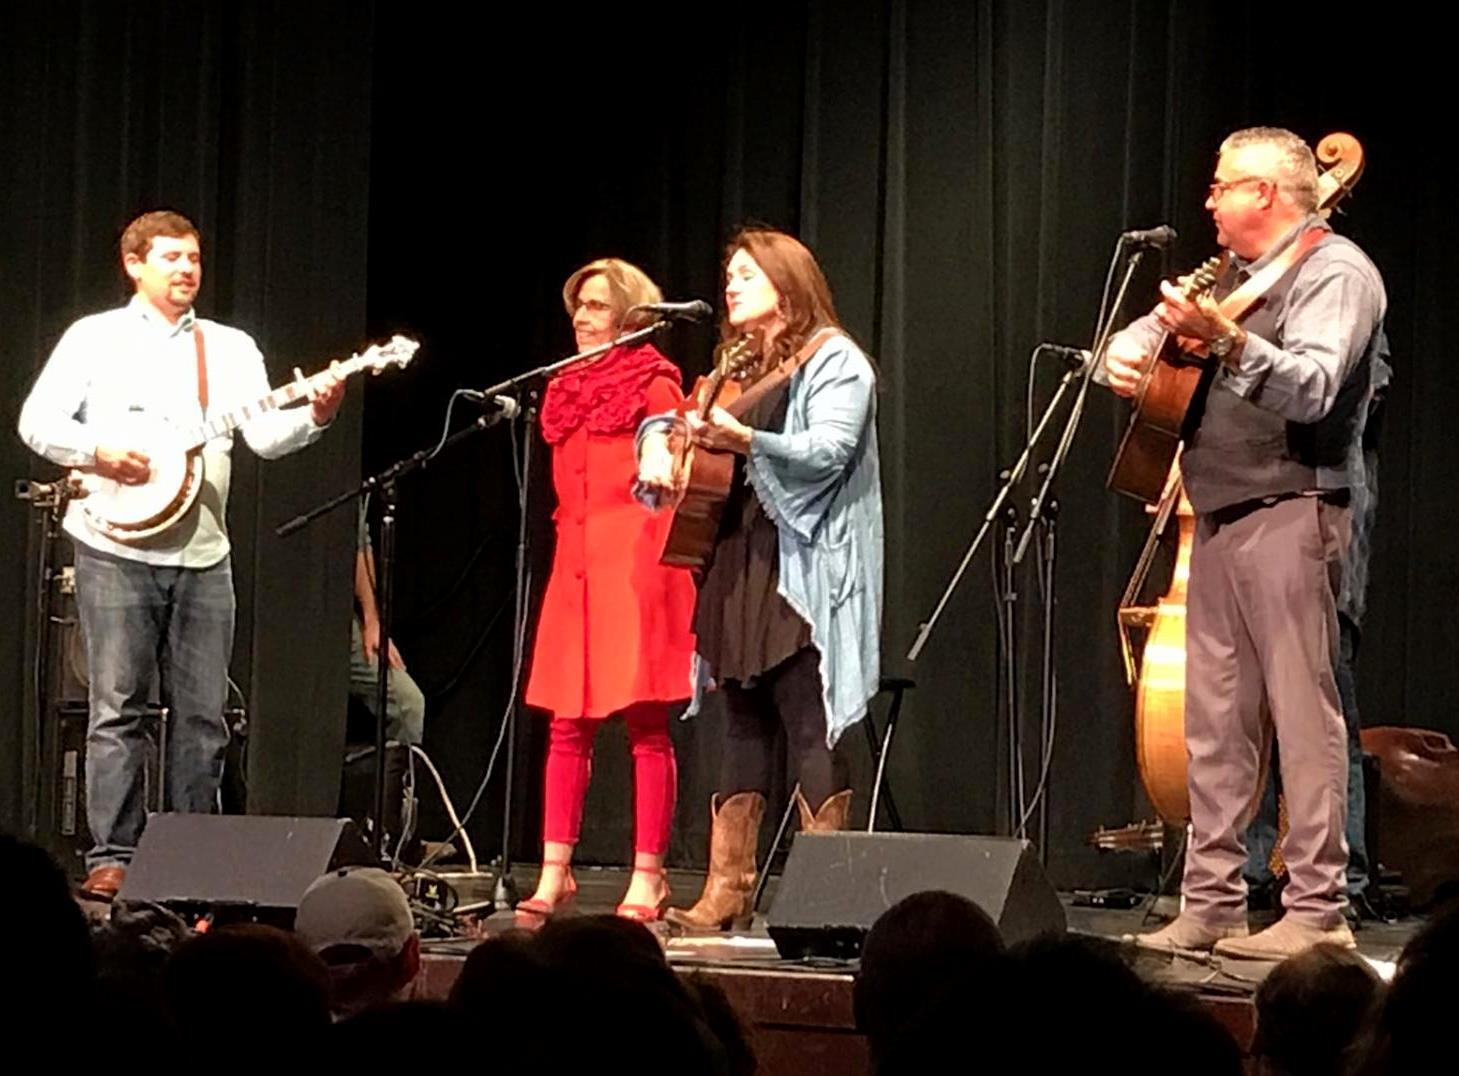 Shirley Owens 84th birthday in McKinney with Kenny & Amanda Smith (2019 photo Leigh Taylor)